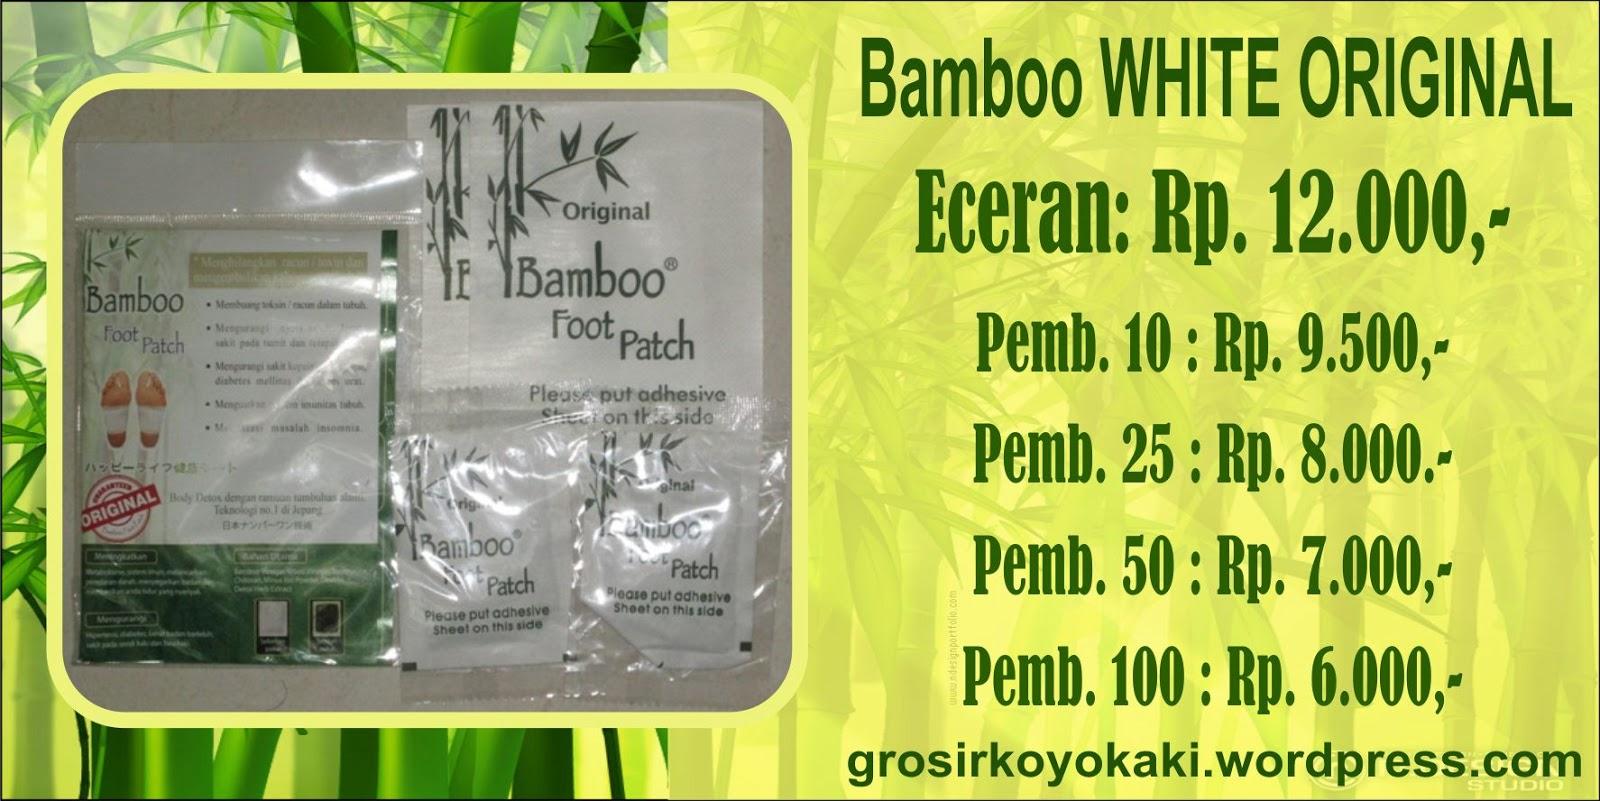 agen besar bamboo white original, bamboo gold surabaya, mengeluarkan racun dalam tubuh, 0856.4578.4363, www.ainanvision.com